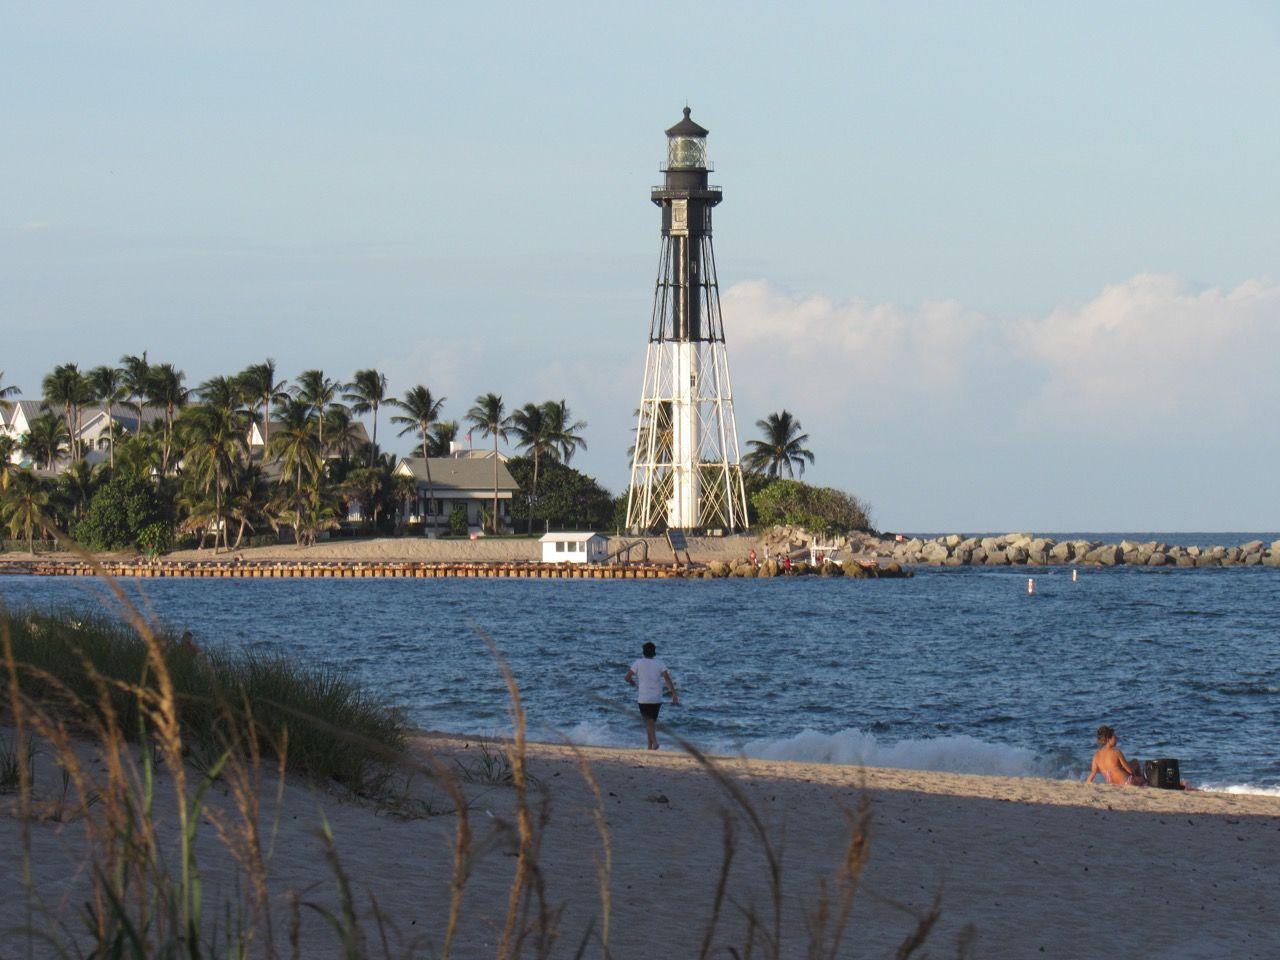 Le phare de Lighouse Point vu depuis Pompano Beach